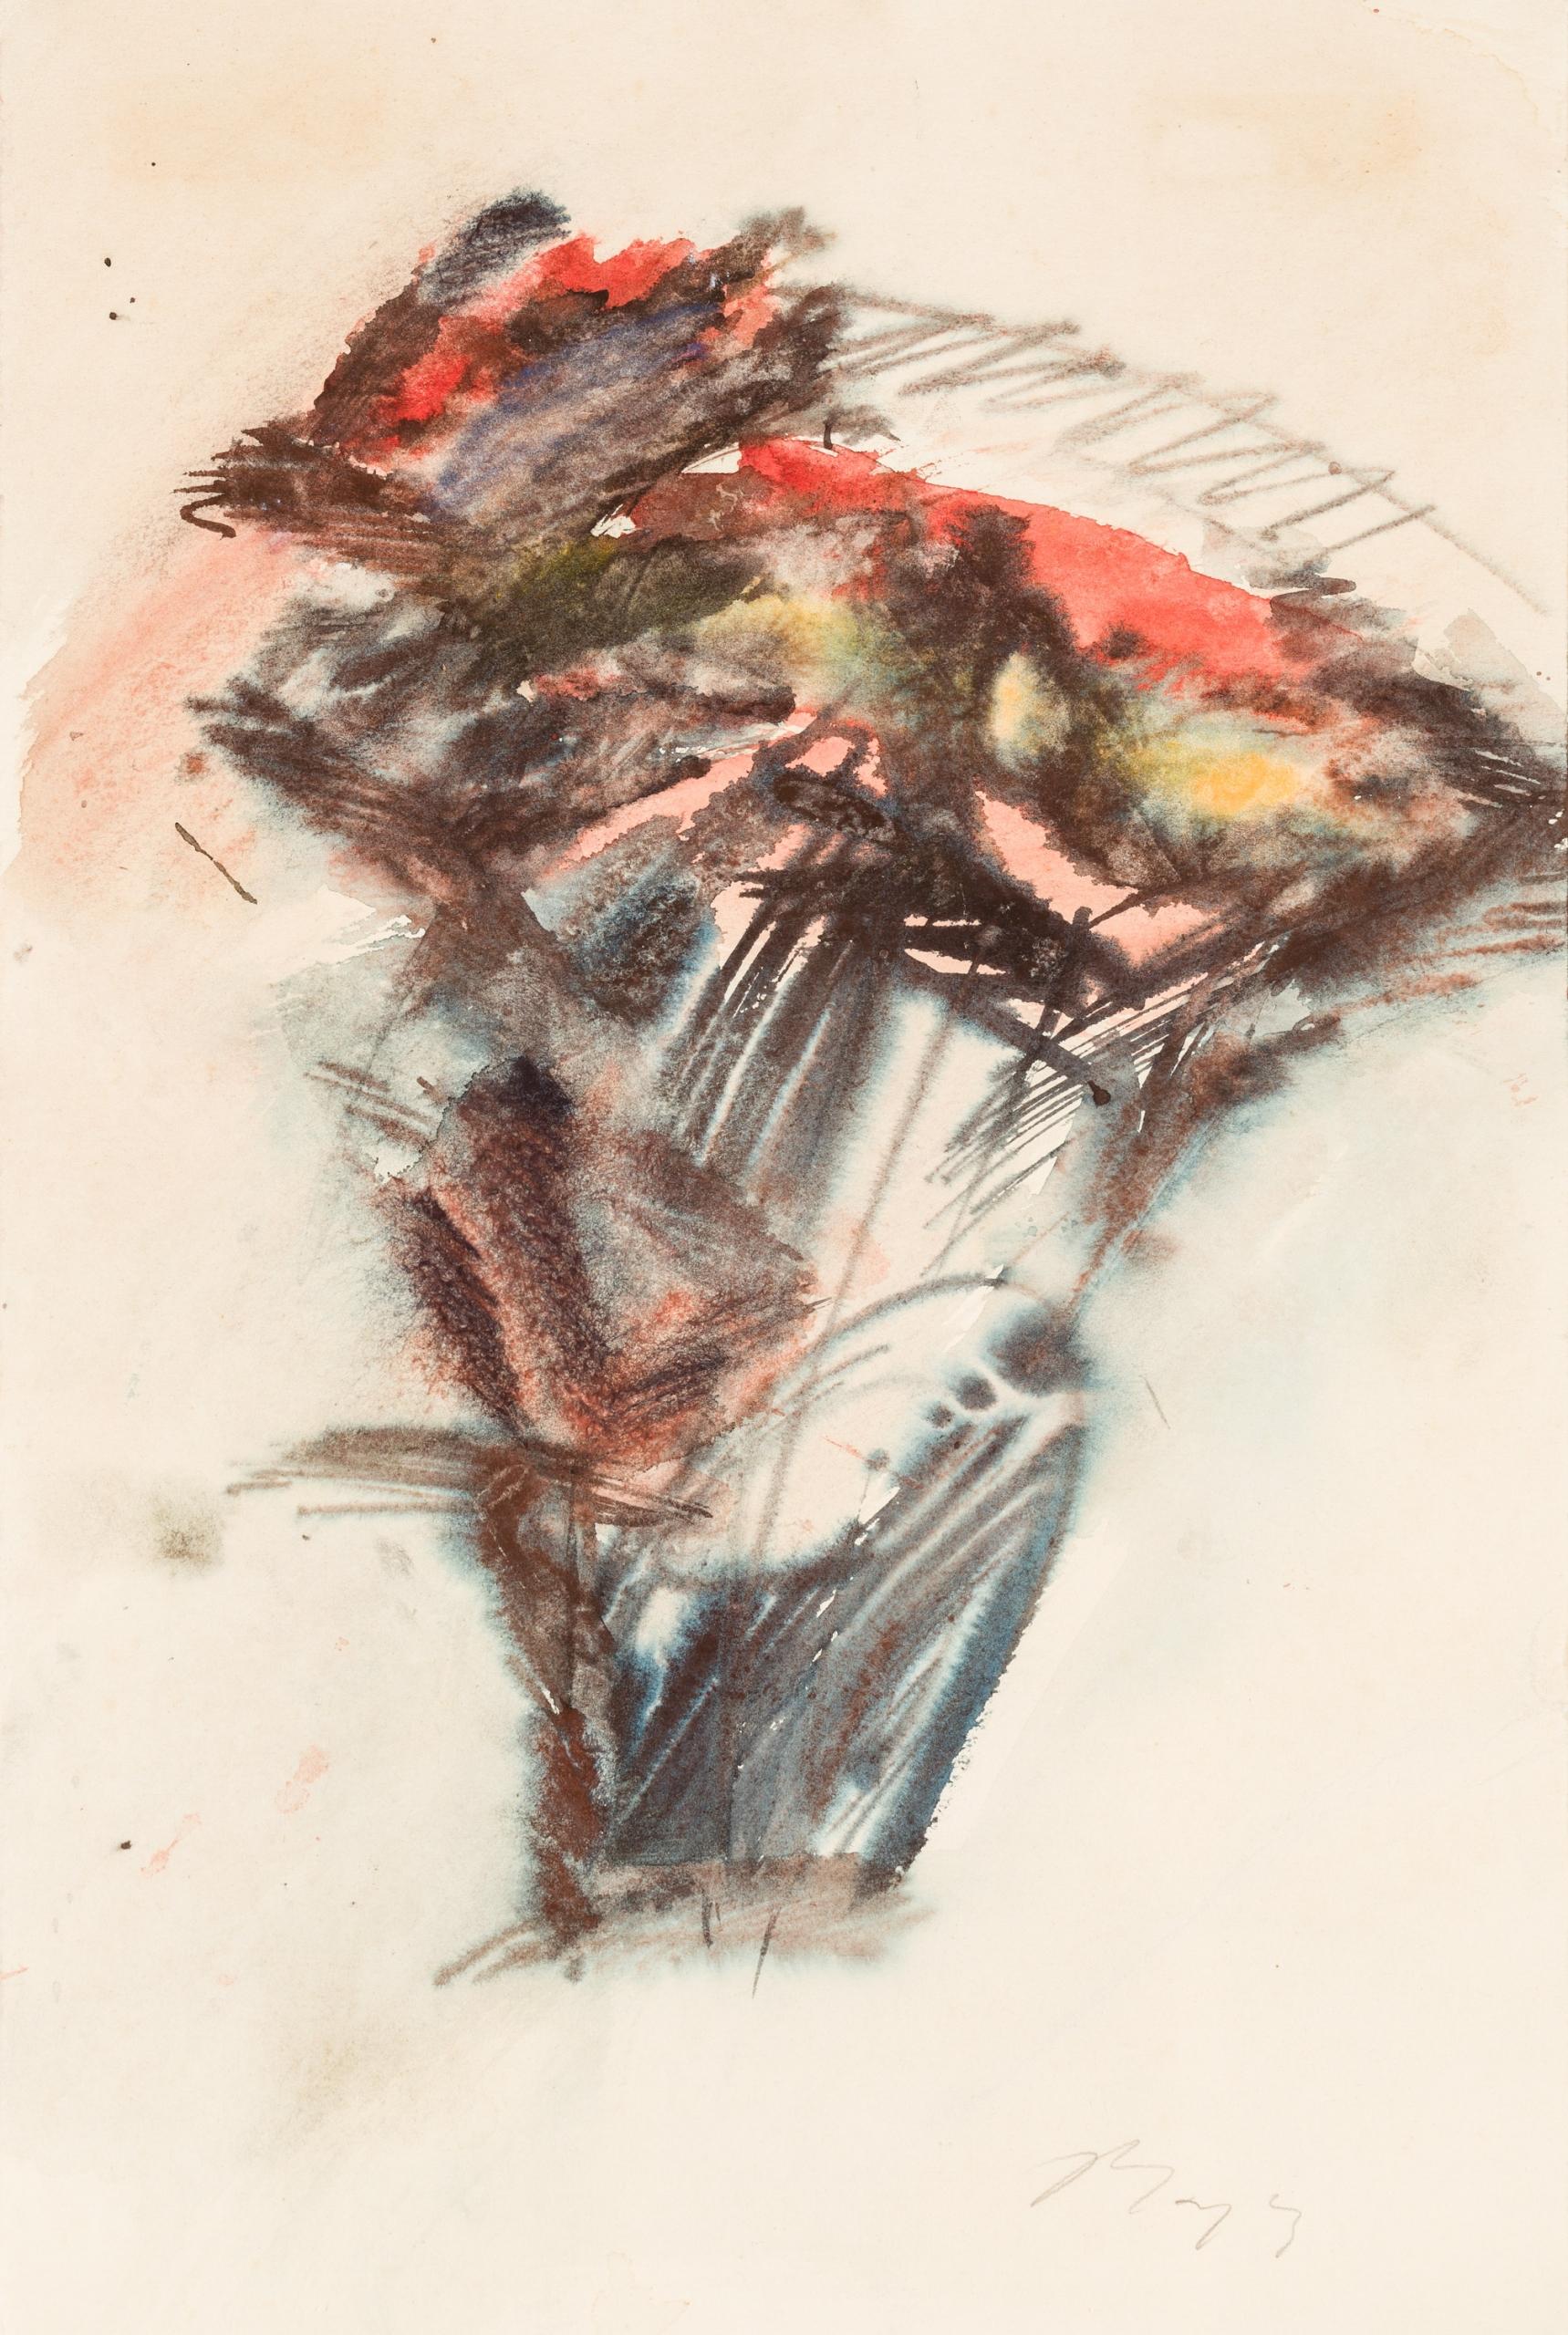 Josef Mikl, Ohne Titel / untitled